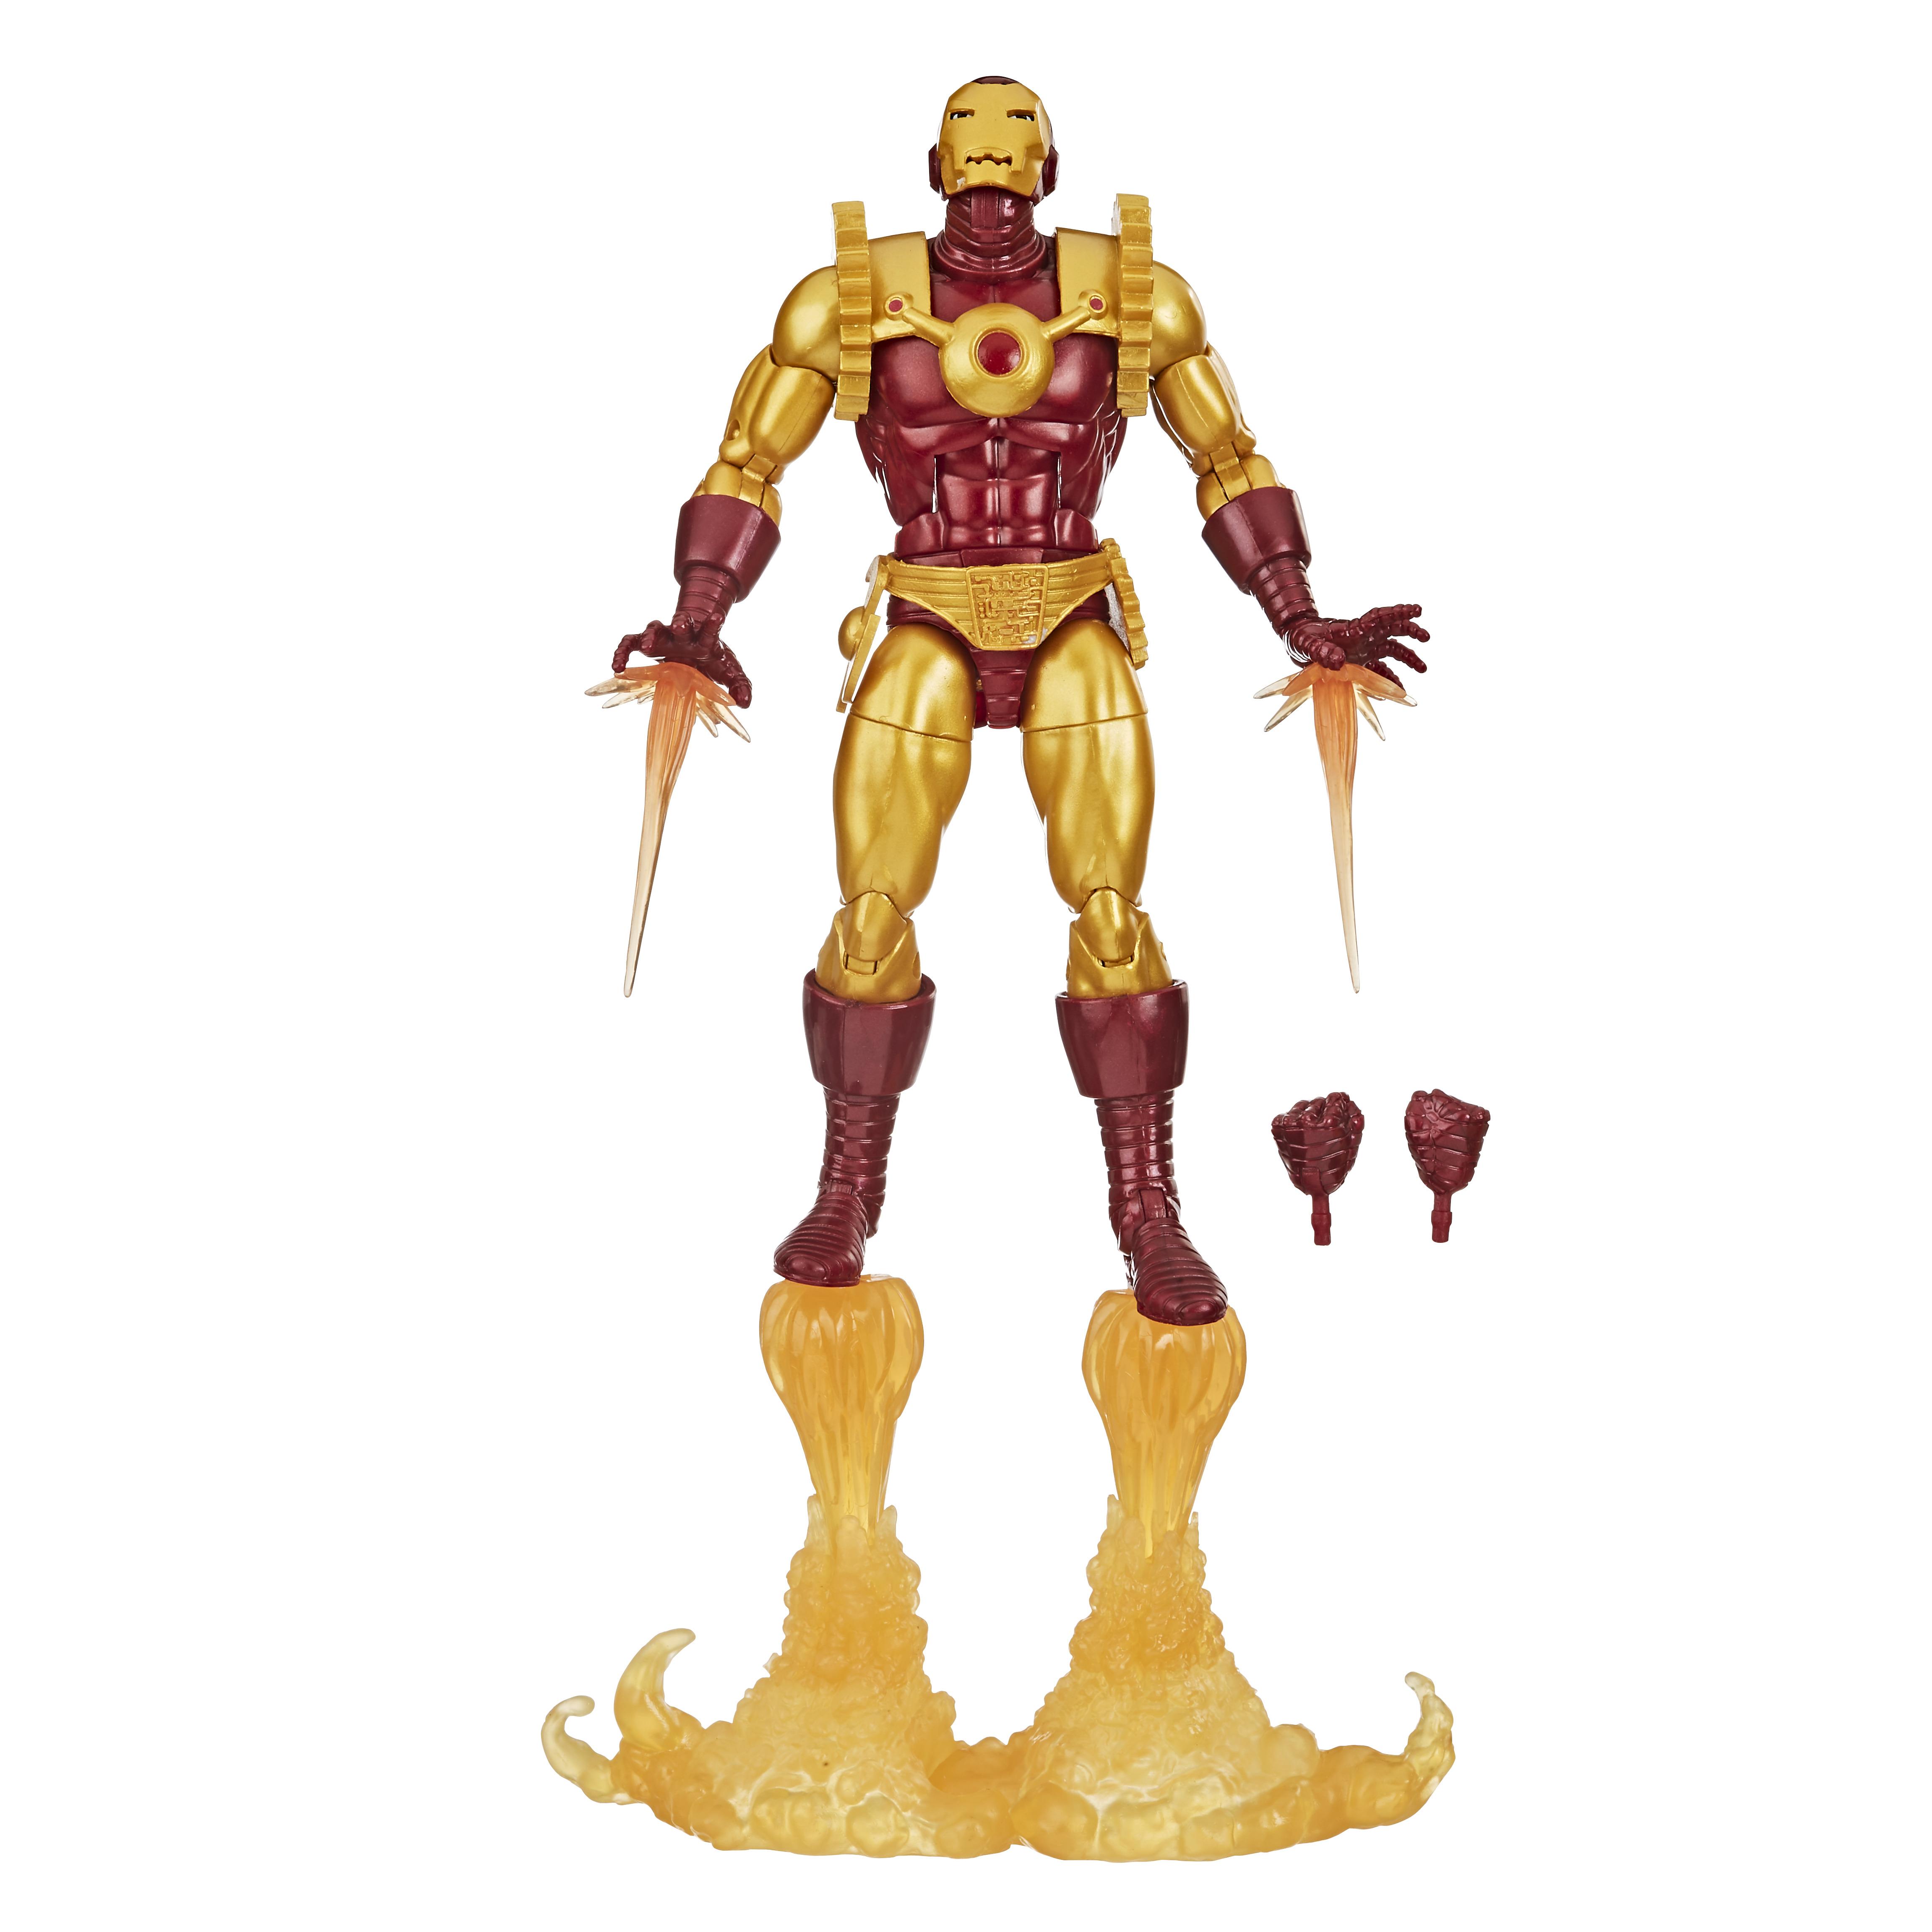 E87085L00 Marvel Legends Iron Man 2020 main